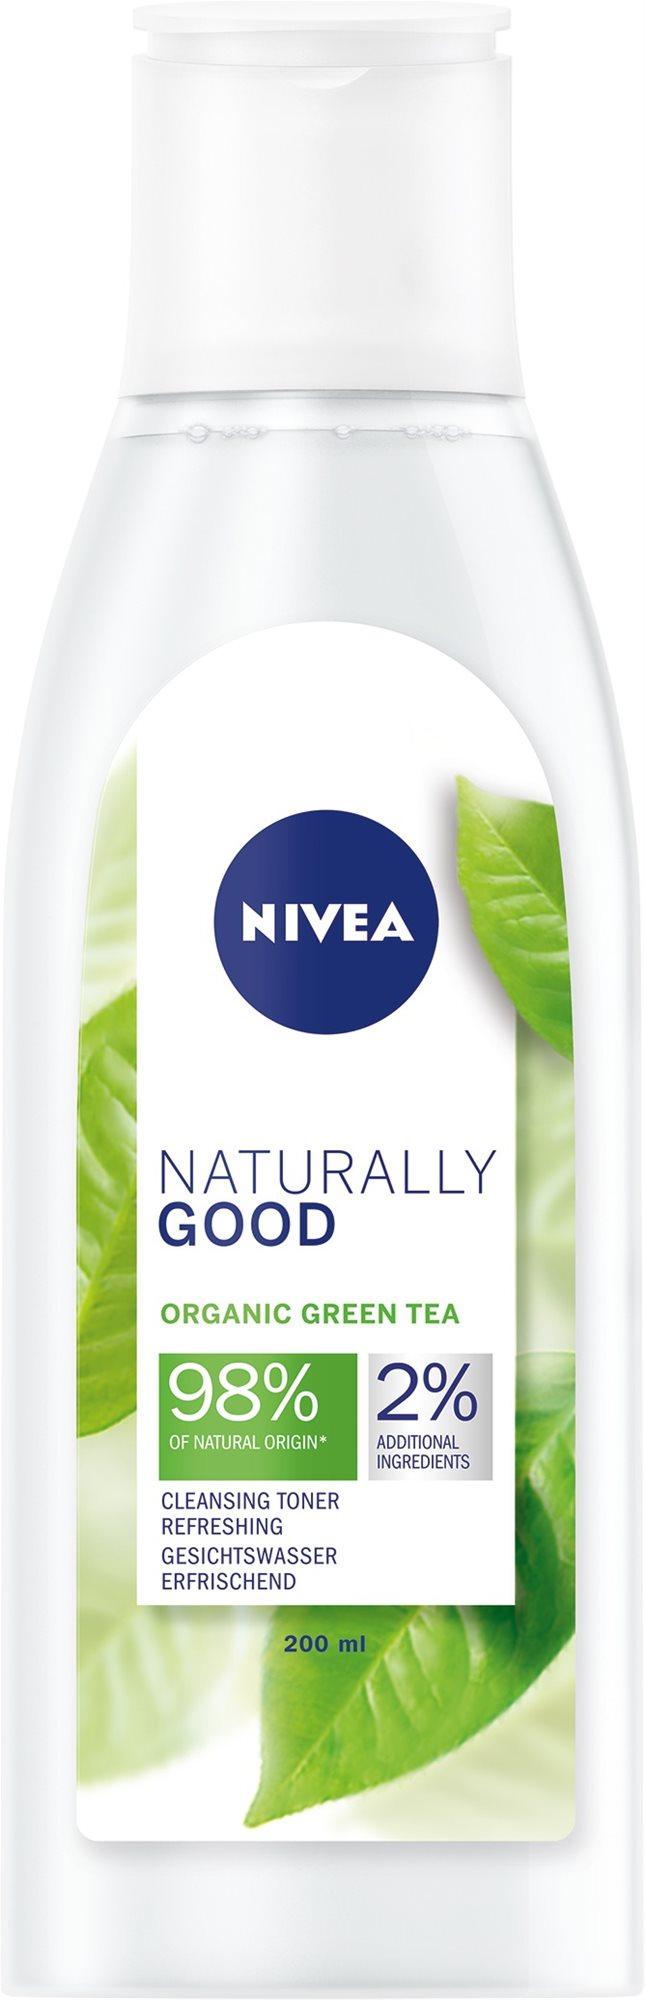 NIVEA Naturally Good Cleansing Tonic 200 ml